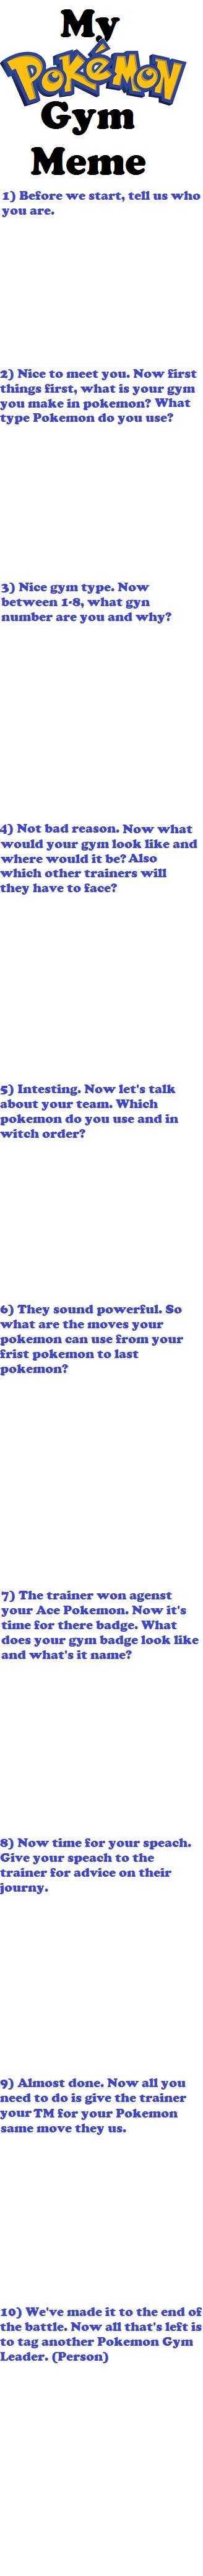 My Pokemon Gym Meme by Light-He-arth